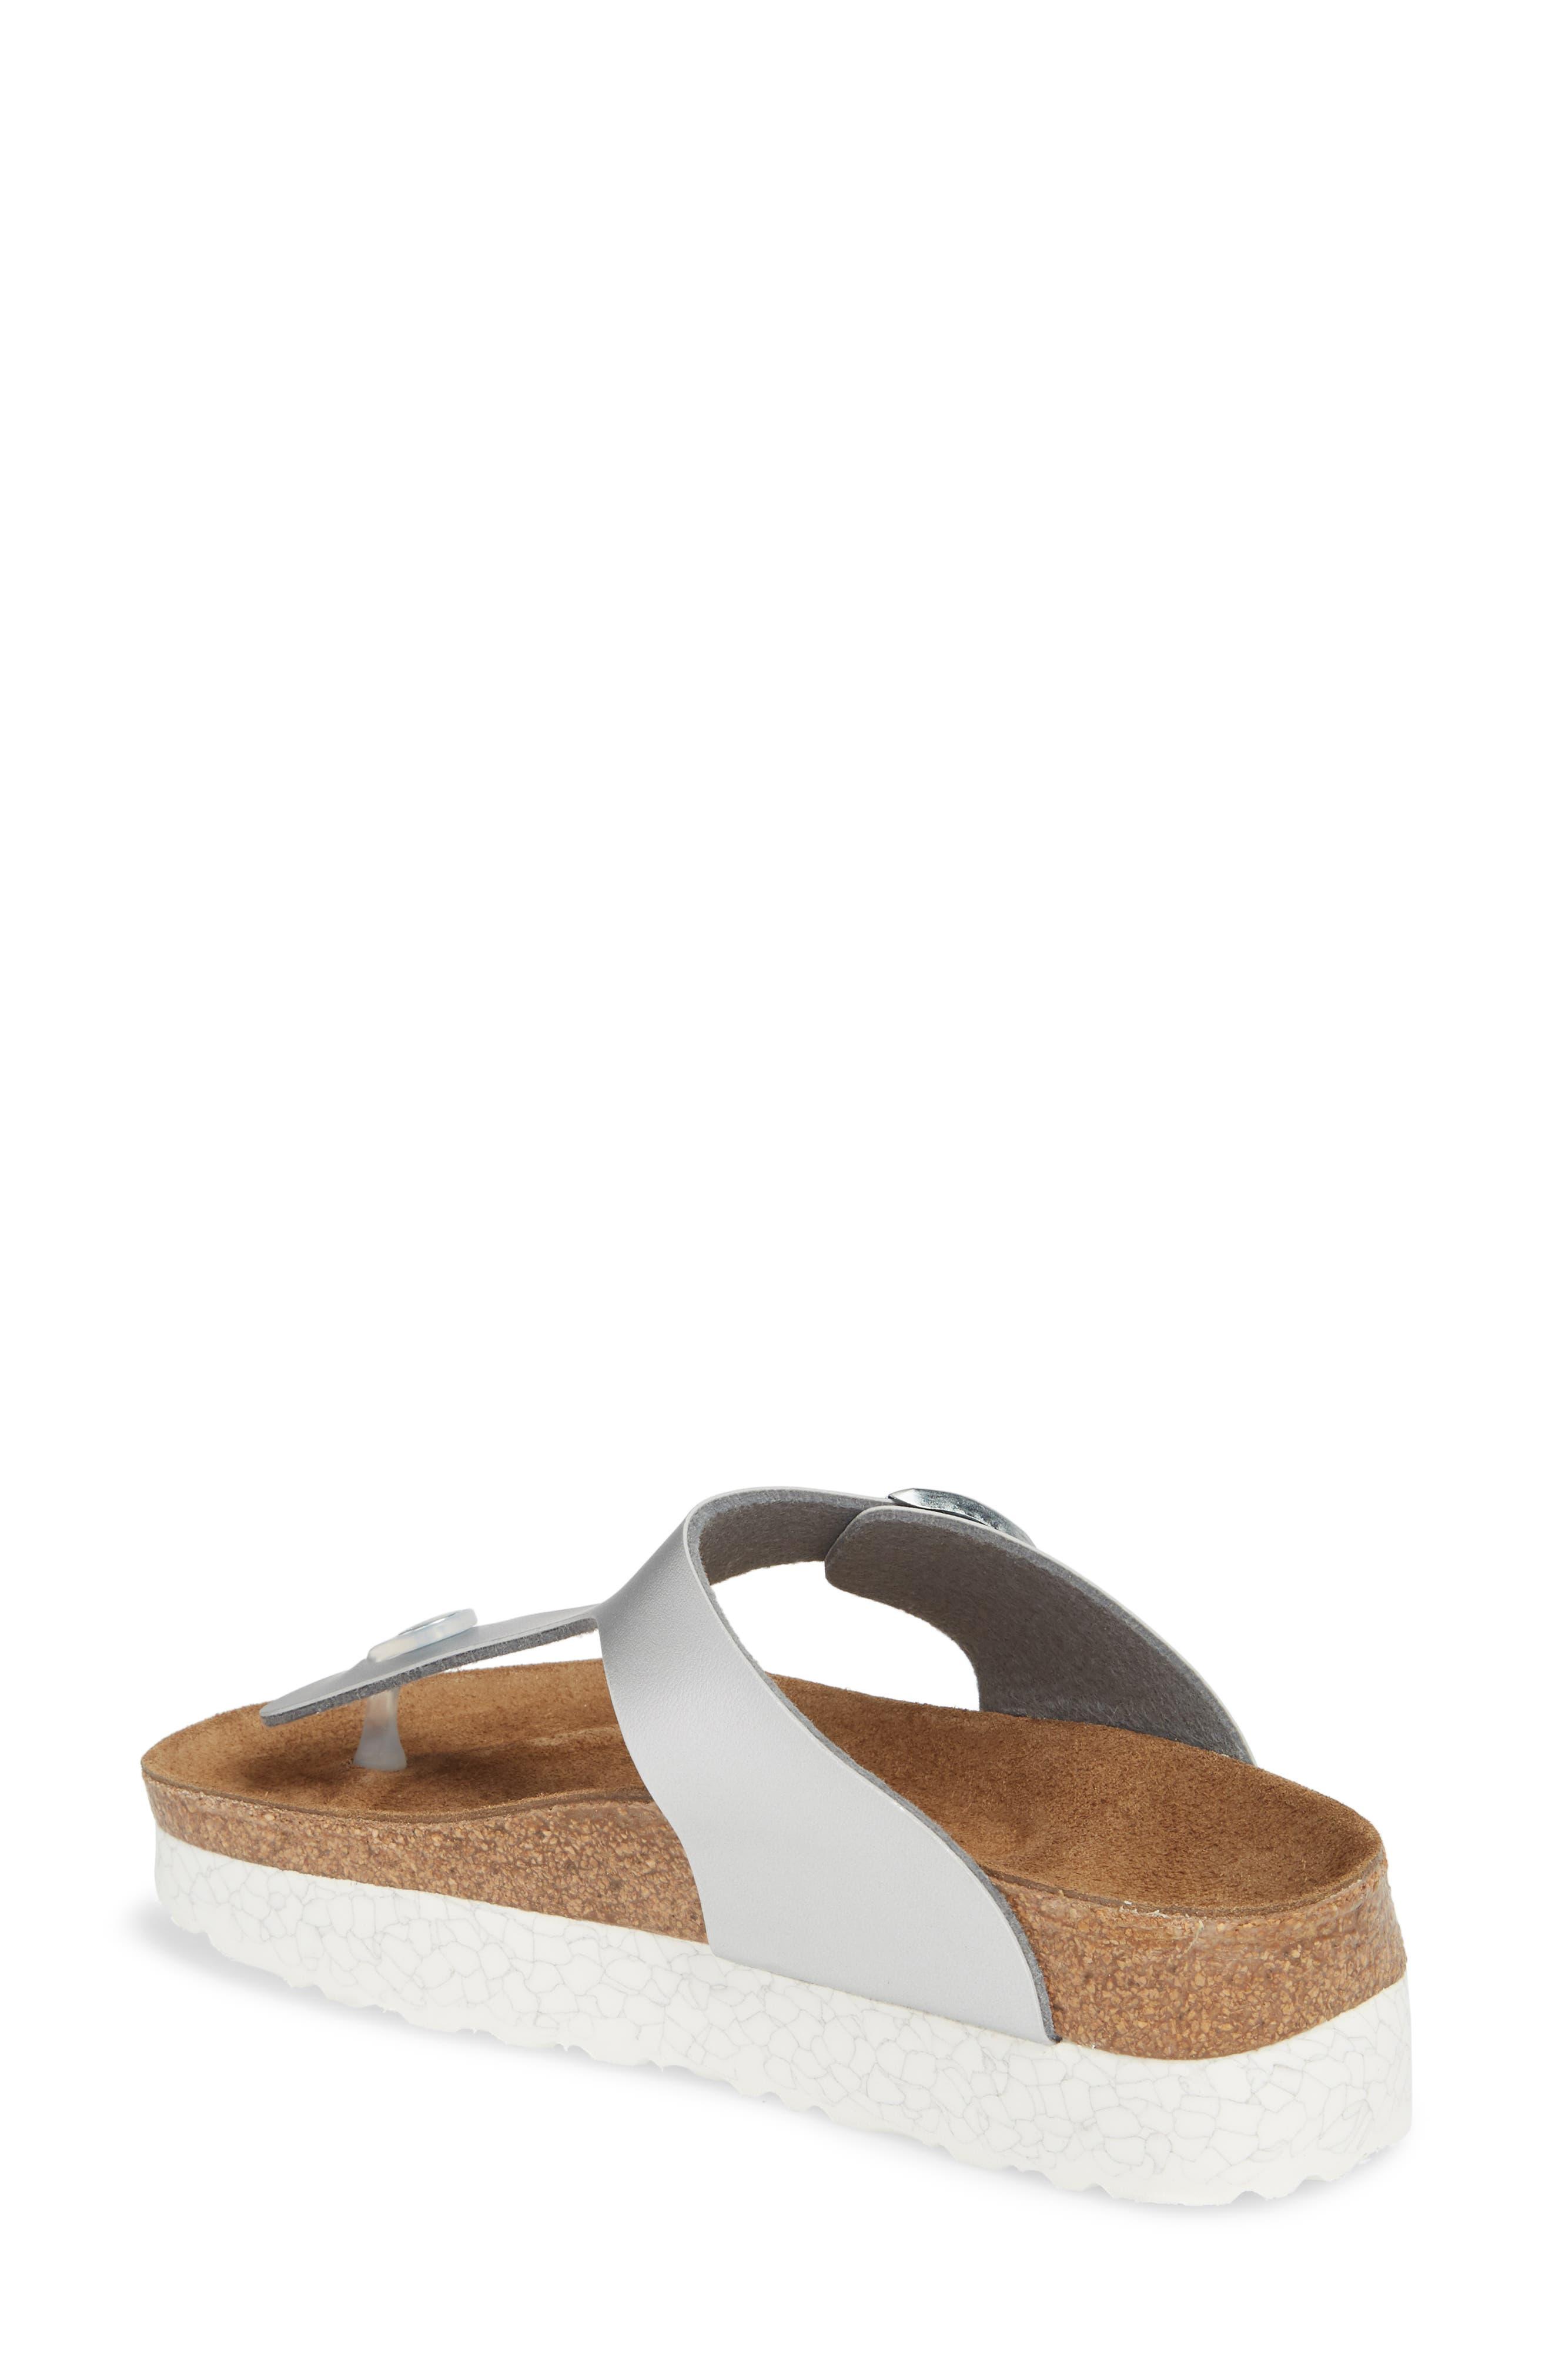 Papillio by Birkenstock 'Gizeh' Birko-Flor Platform Flip Flop Sandal,                             Alternate thumbnail 2, color,                             Mono Marble Silver Leather